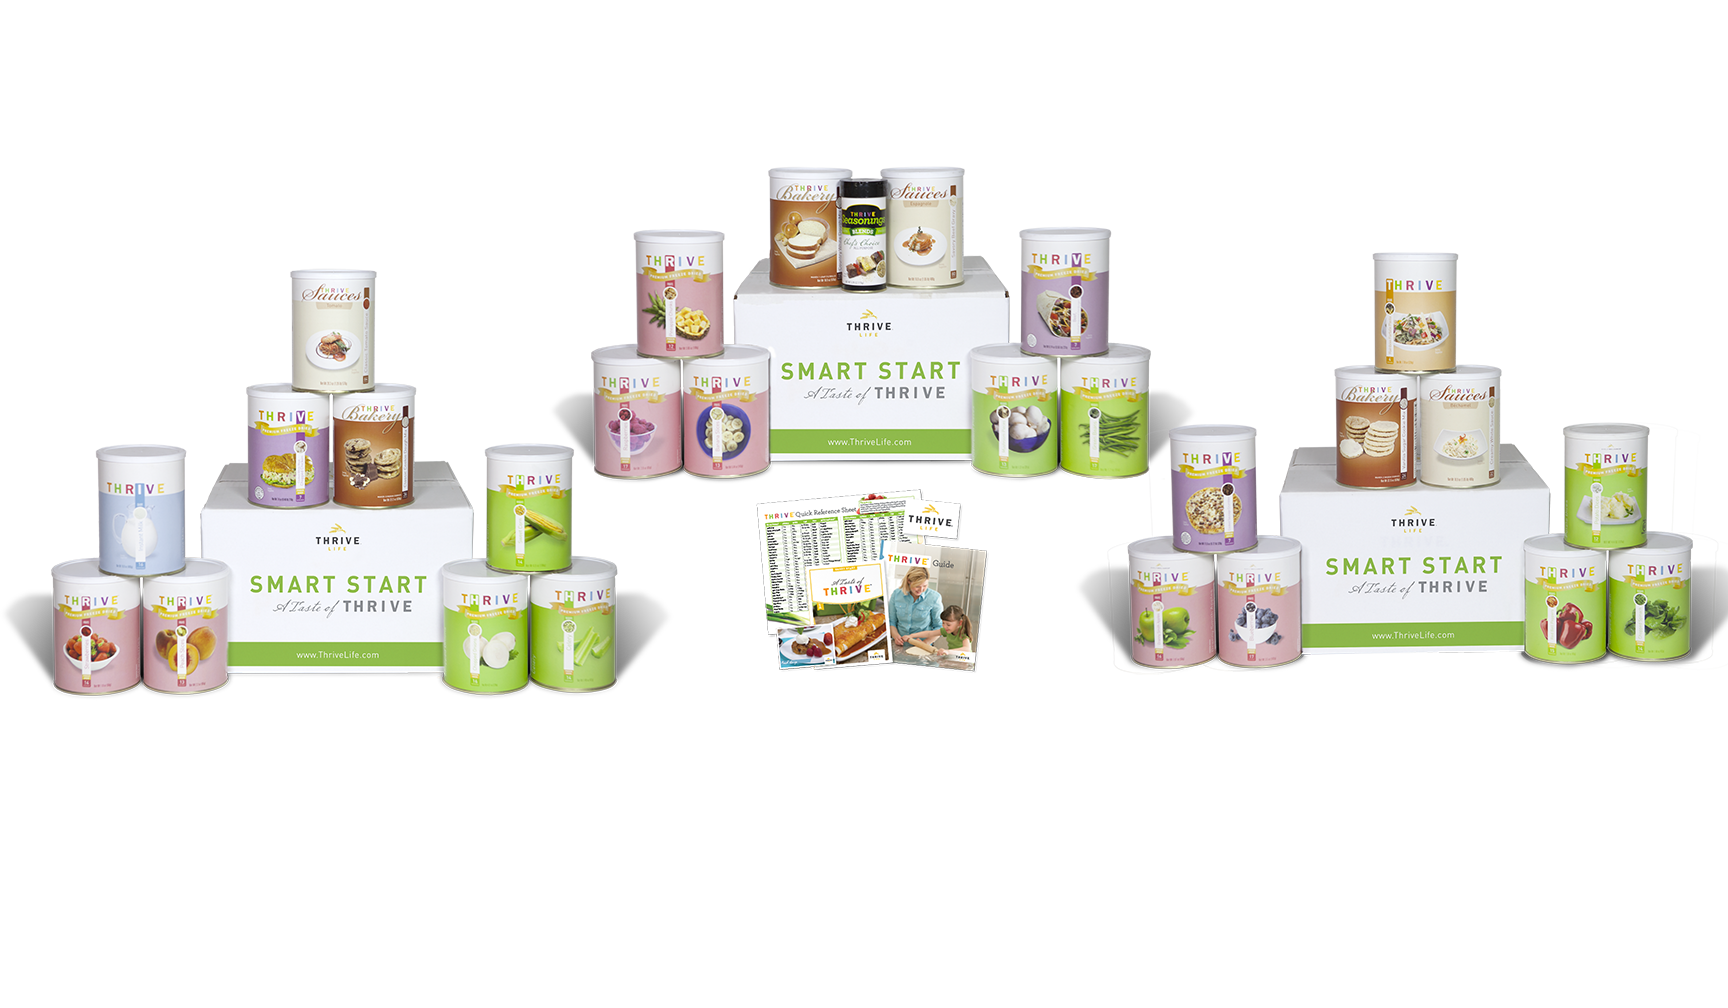 Smart Start: A Taste of THRIVE